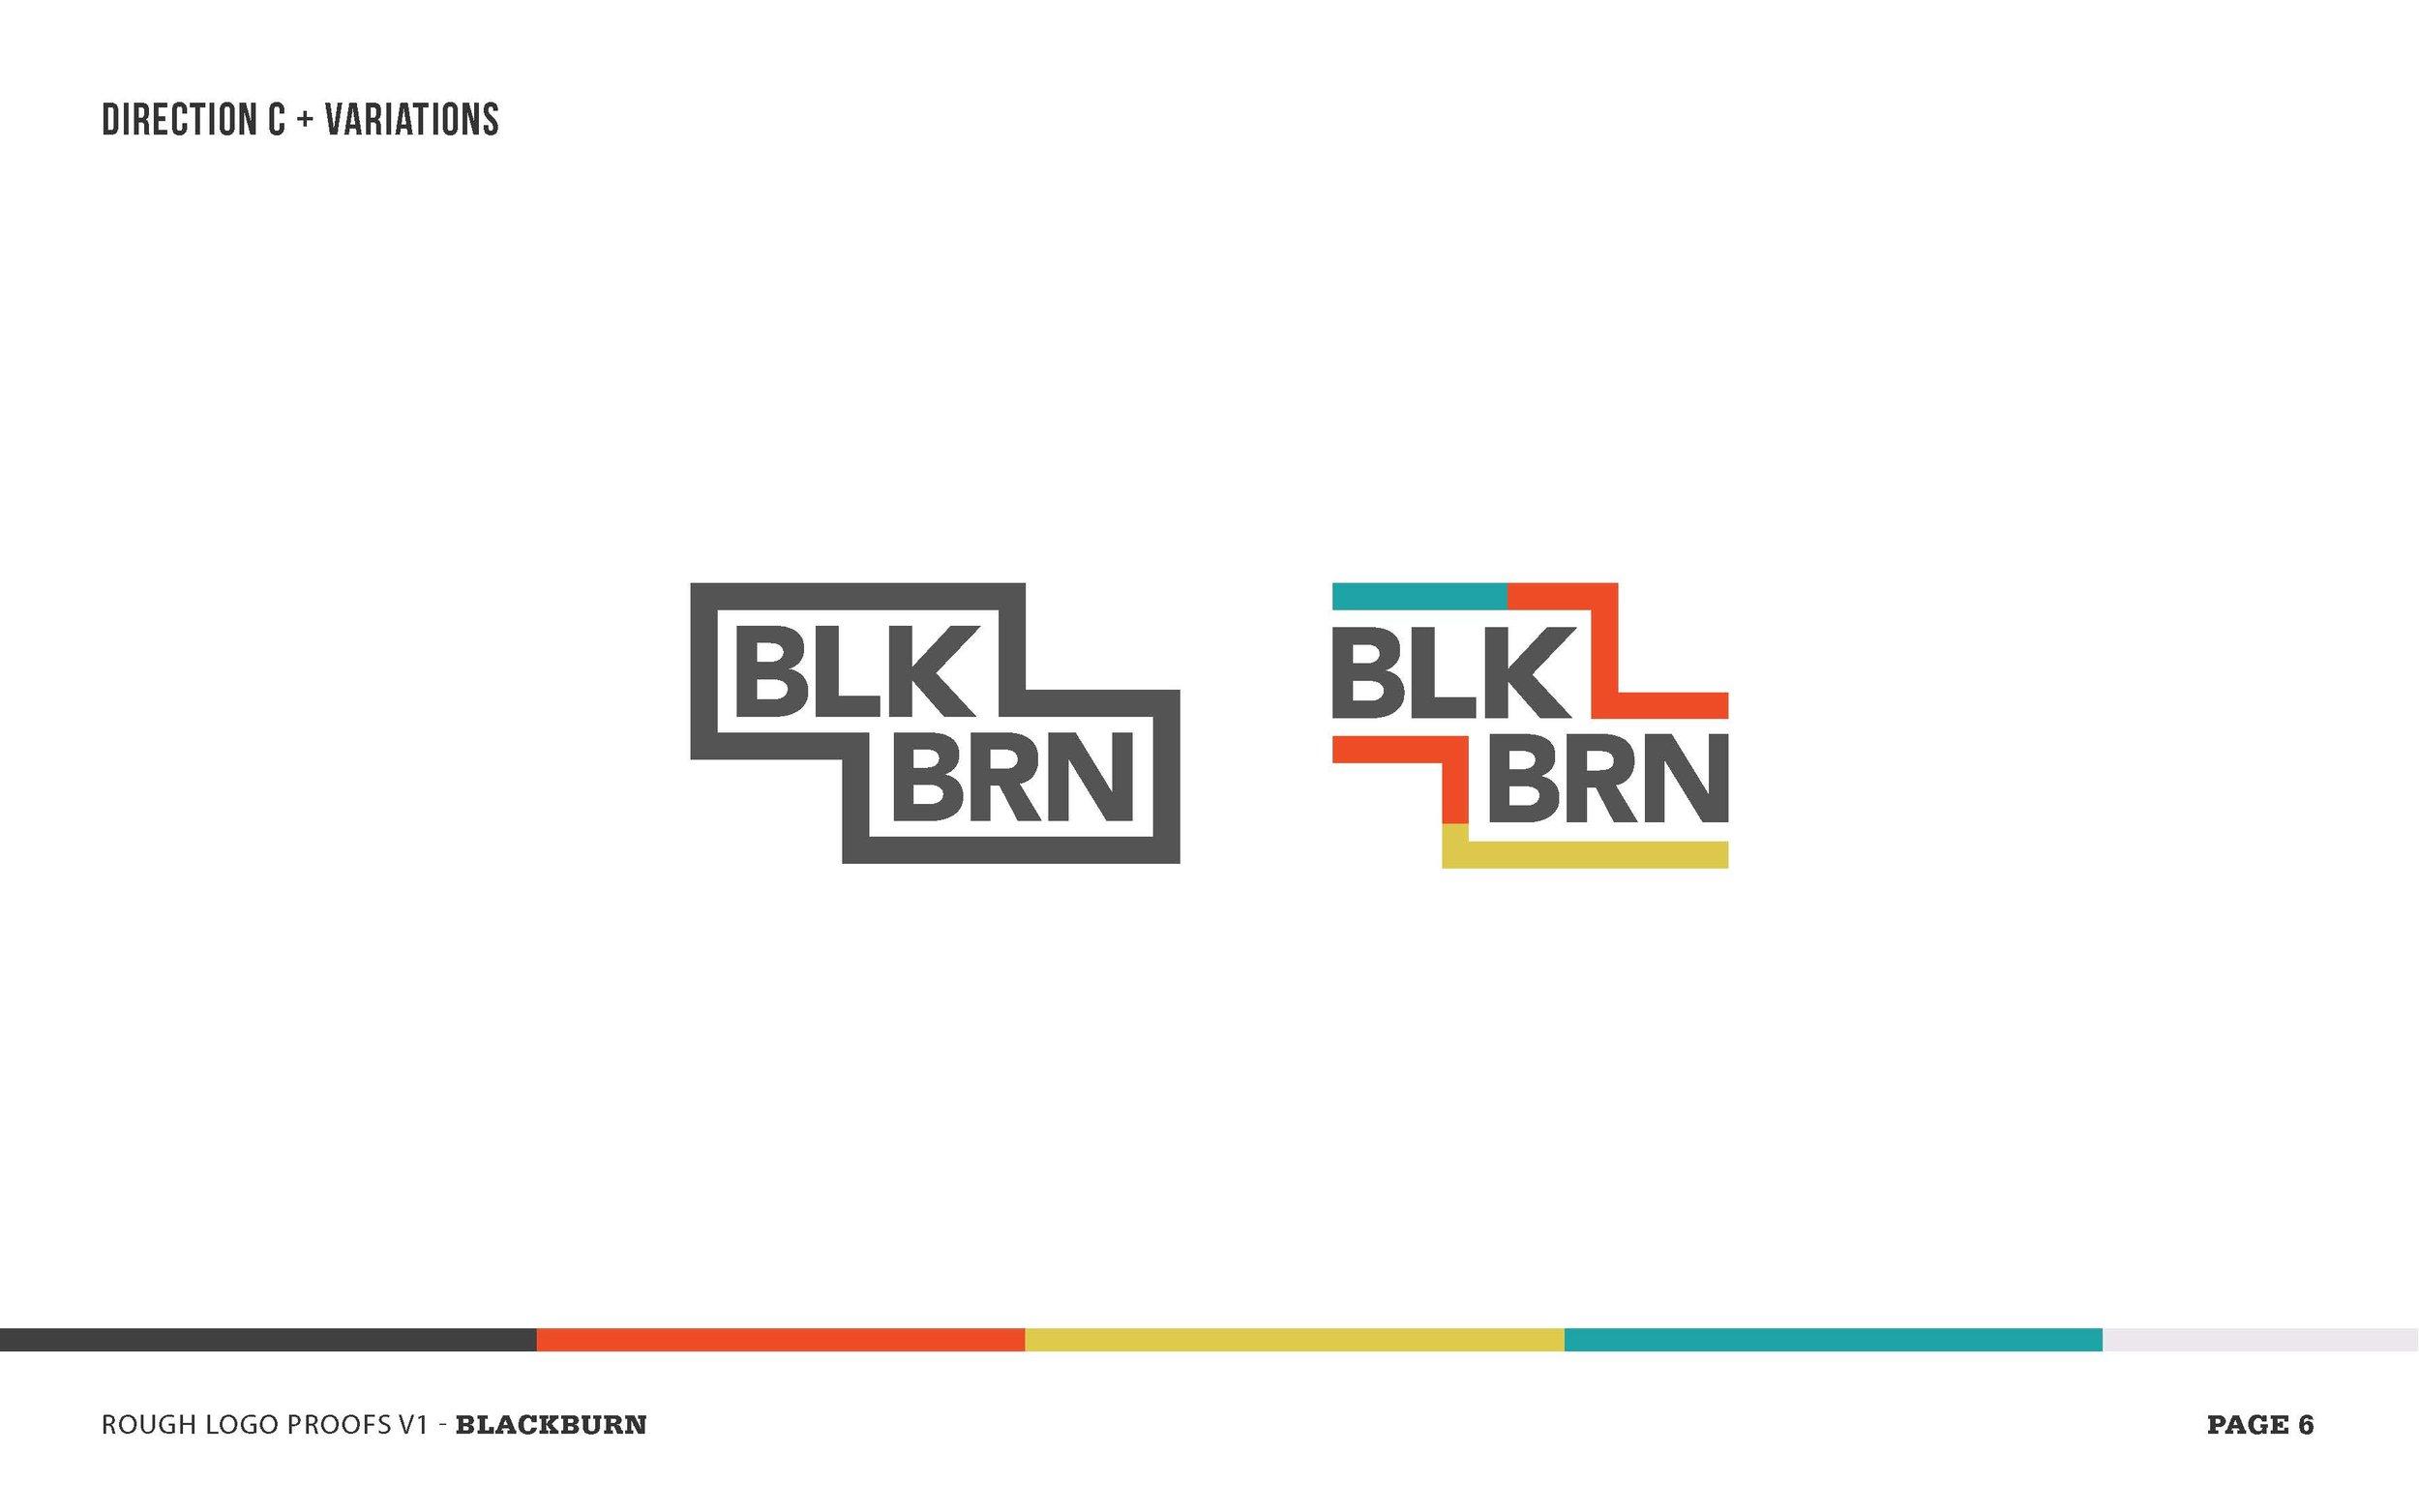 blkbrn-logo-rough-presentation-v1-max_Page_6.jpg